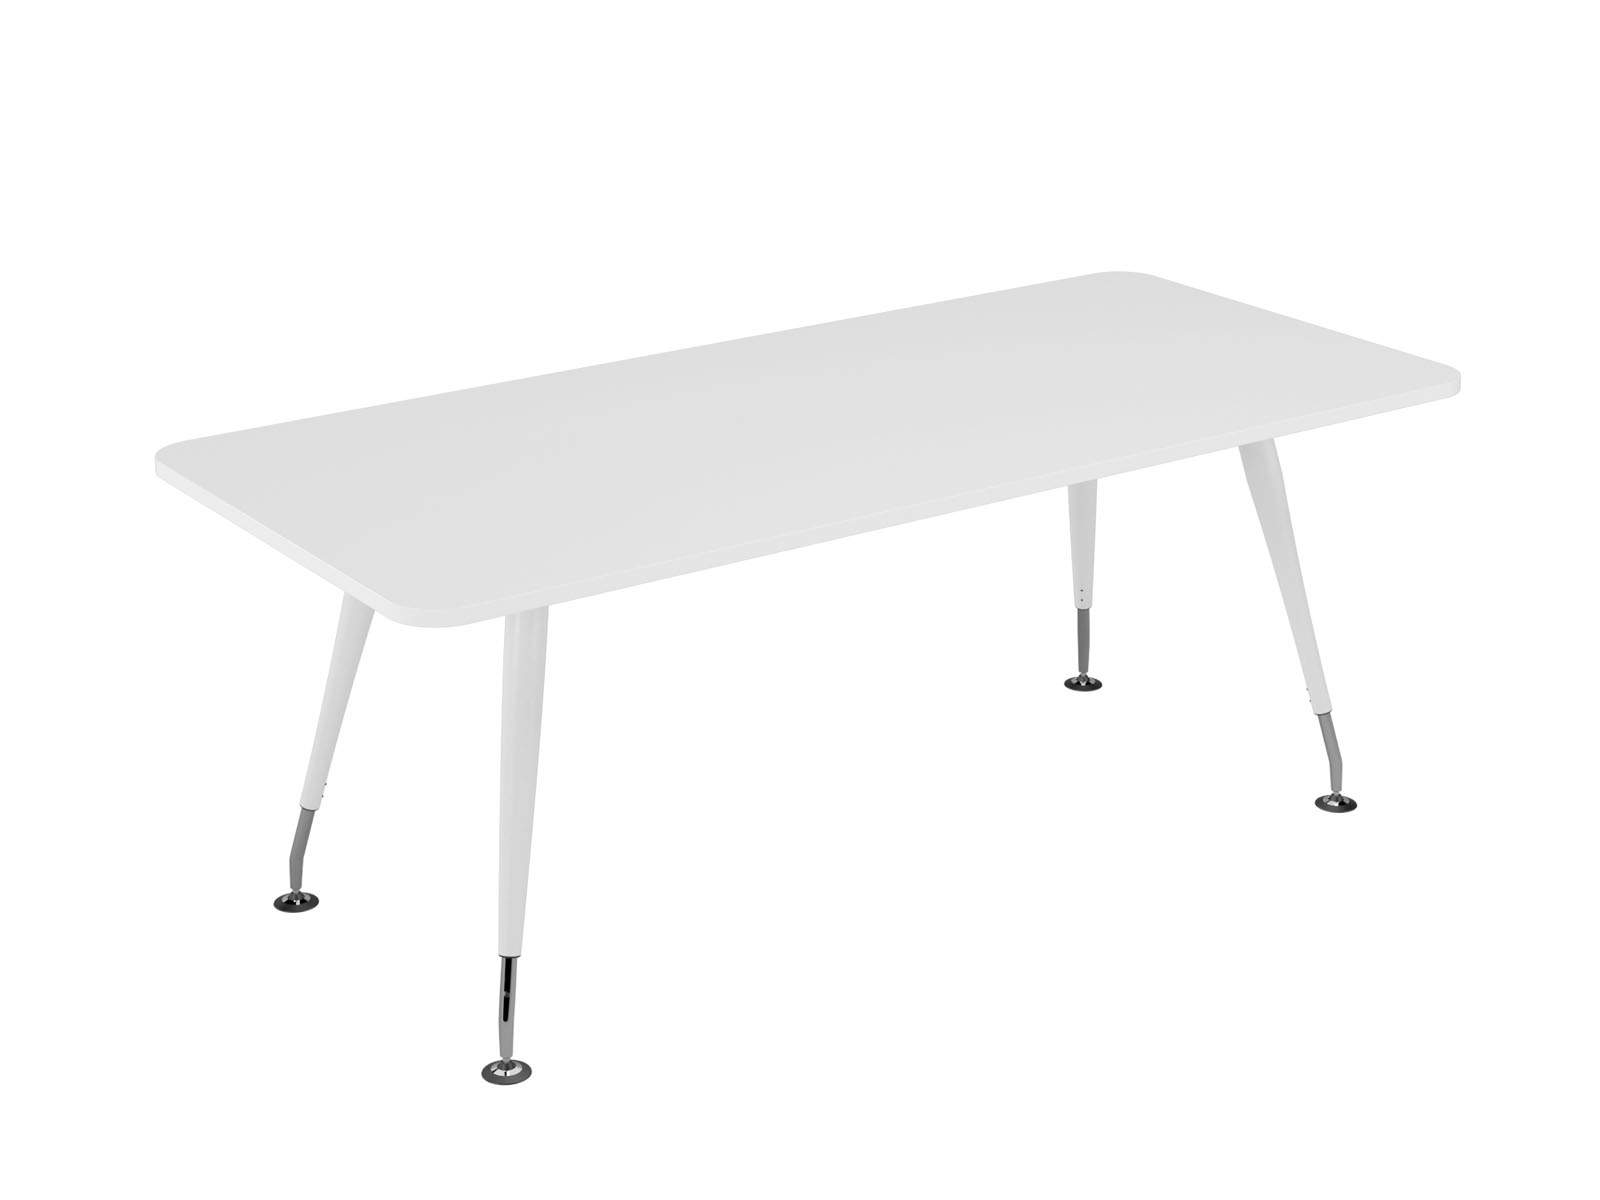 Стол для руководителя  прямой 1800x900x720